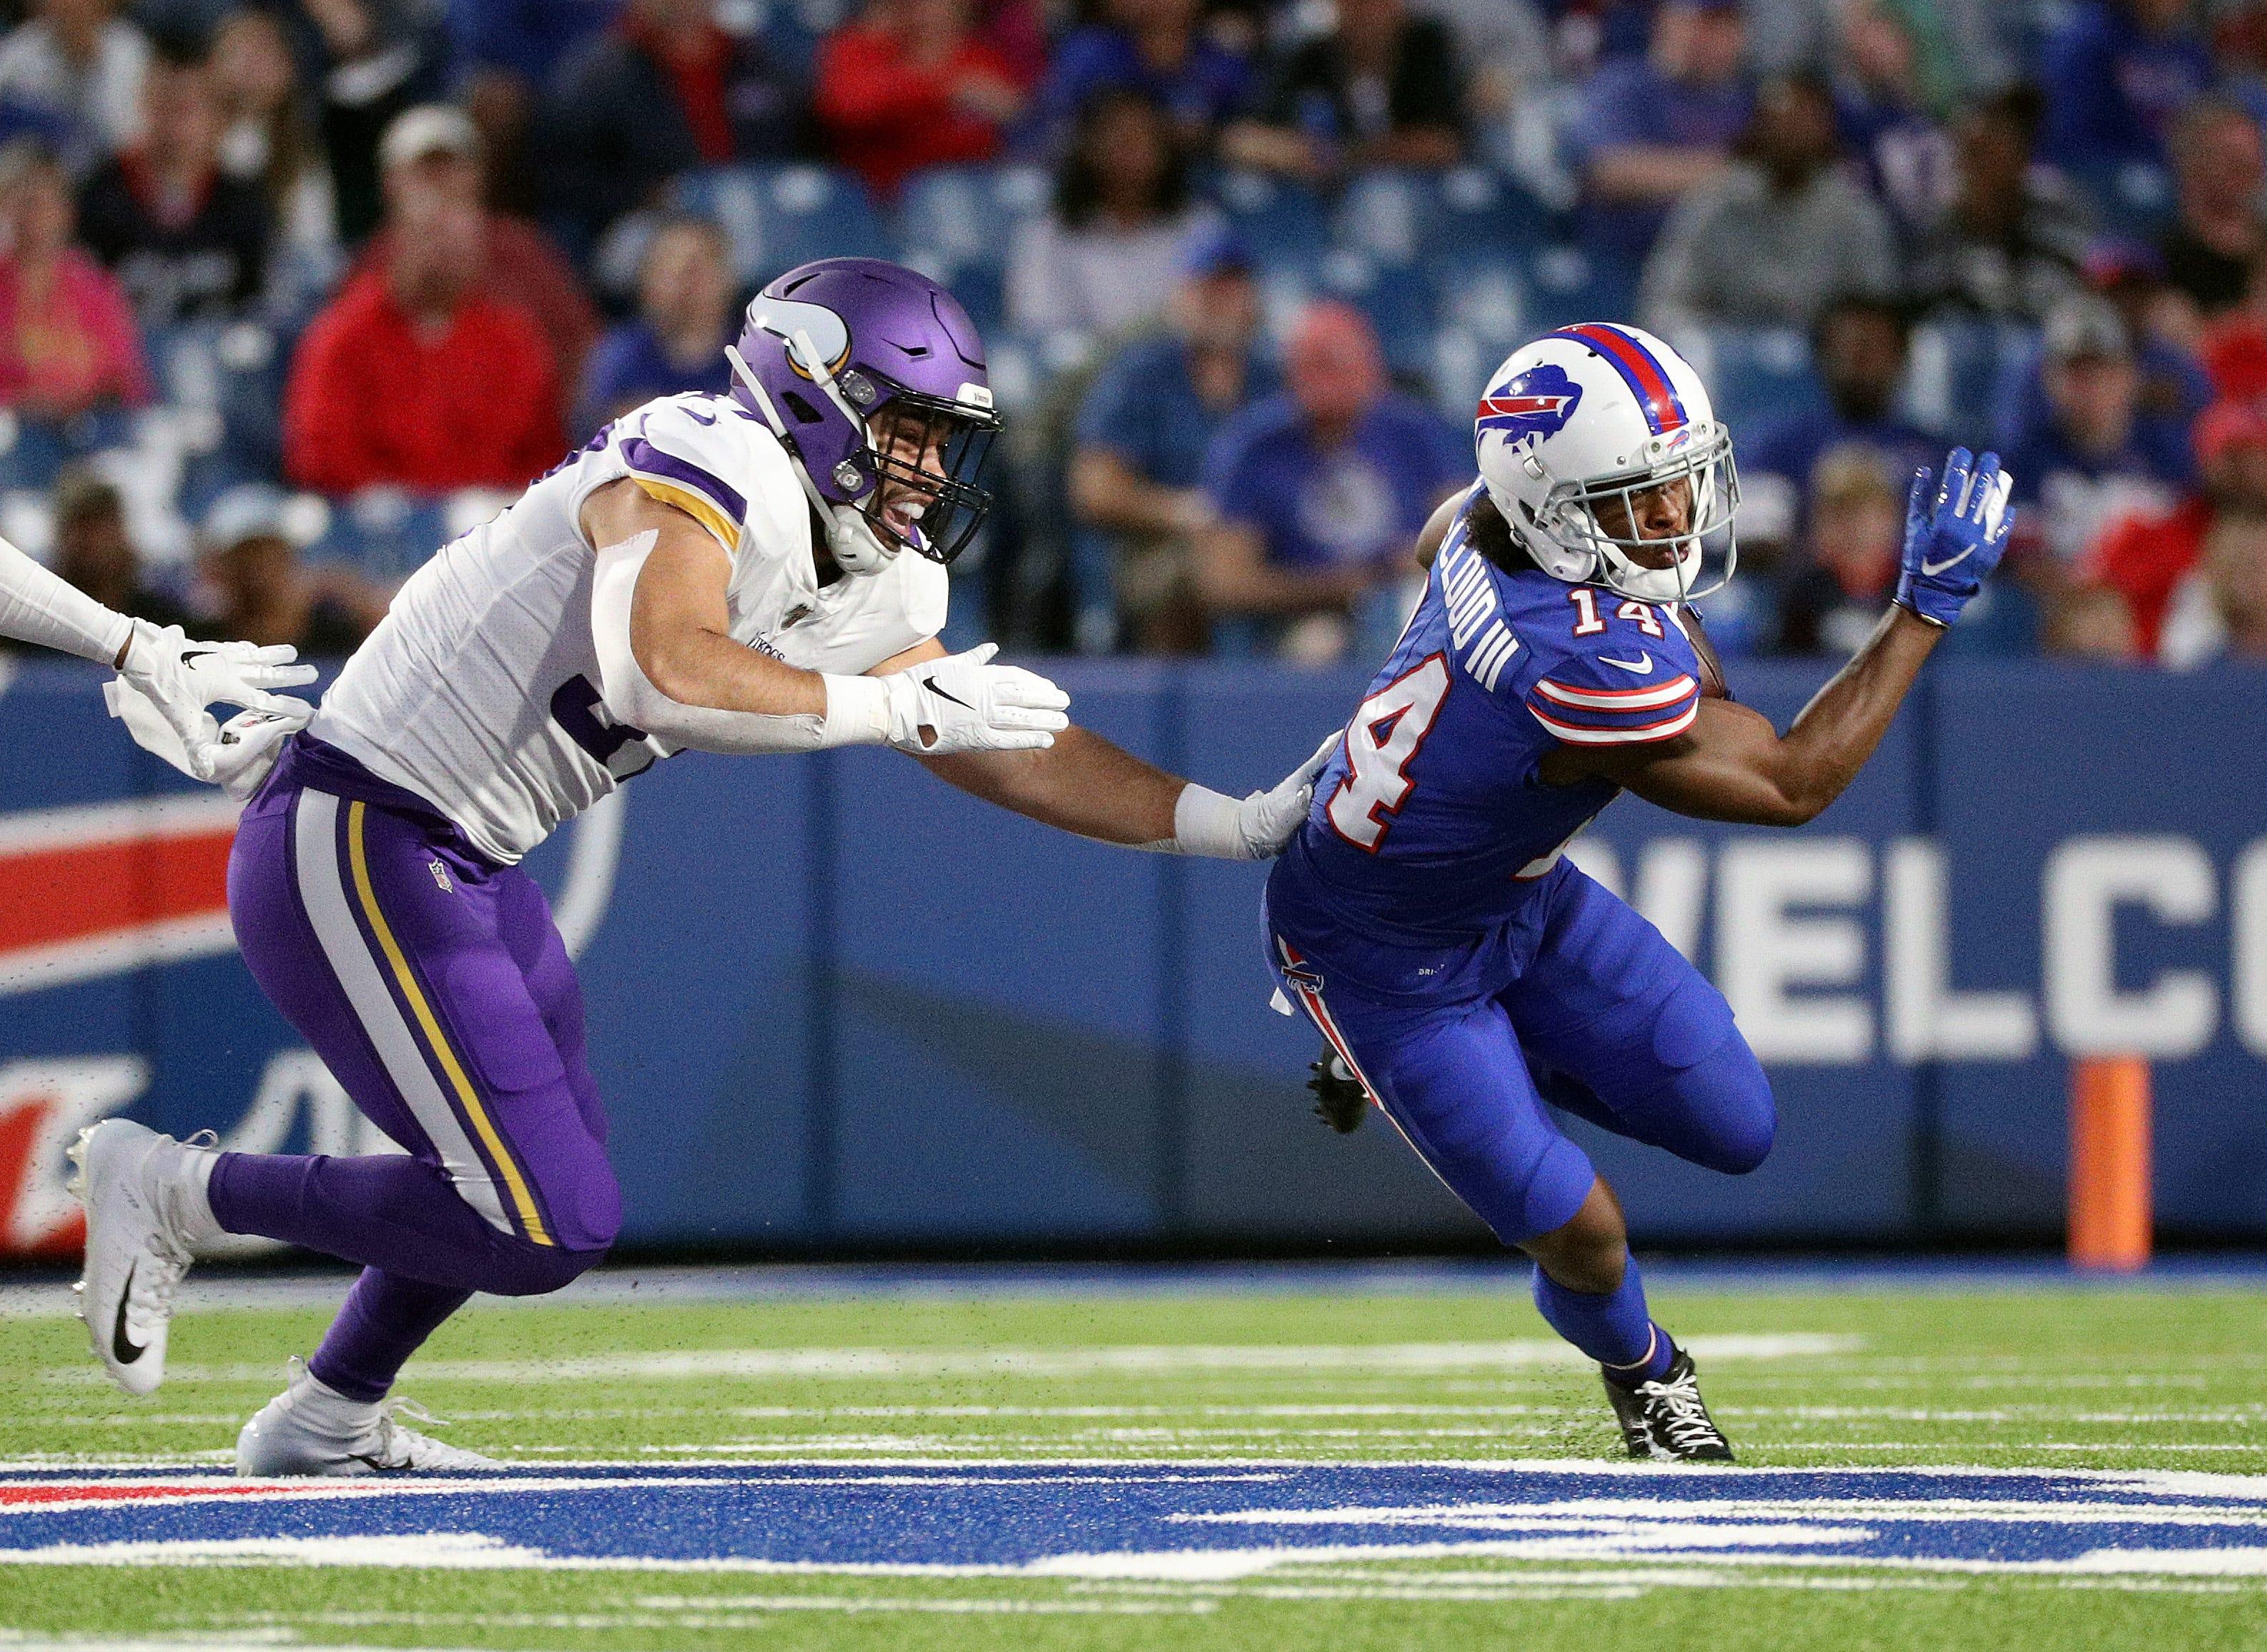 Bills use 5-9 receiver Ray-Ray McCloud to mimic Ravens QB Lamar Jackson